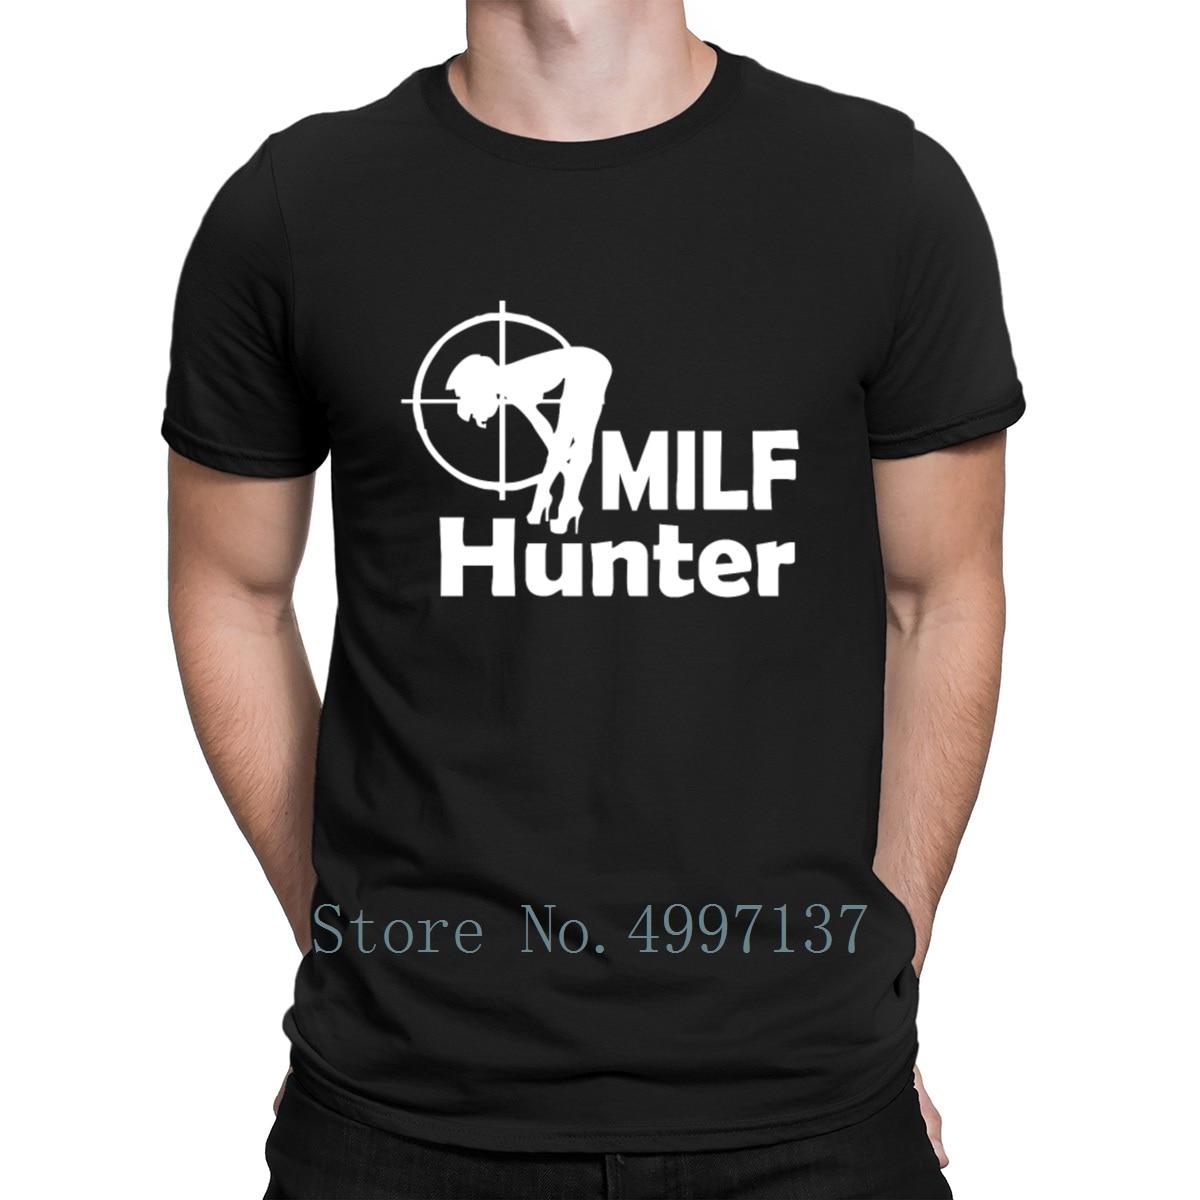 Milf Hunter T Shirt Kawaii Sunlight Authentic 100% Cotton Pattern Spring Autumn Round Neck Knitted Shirt